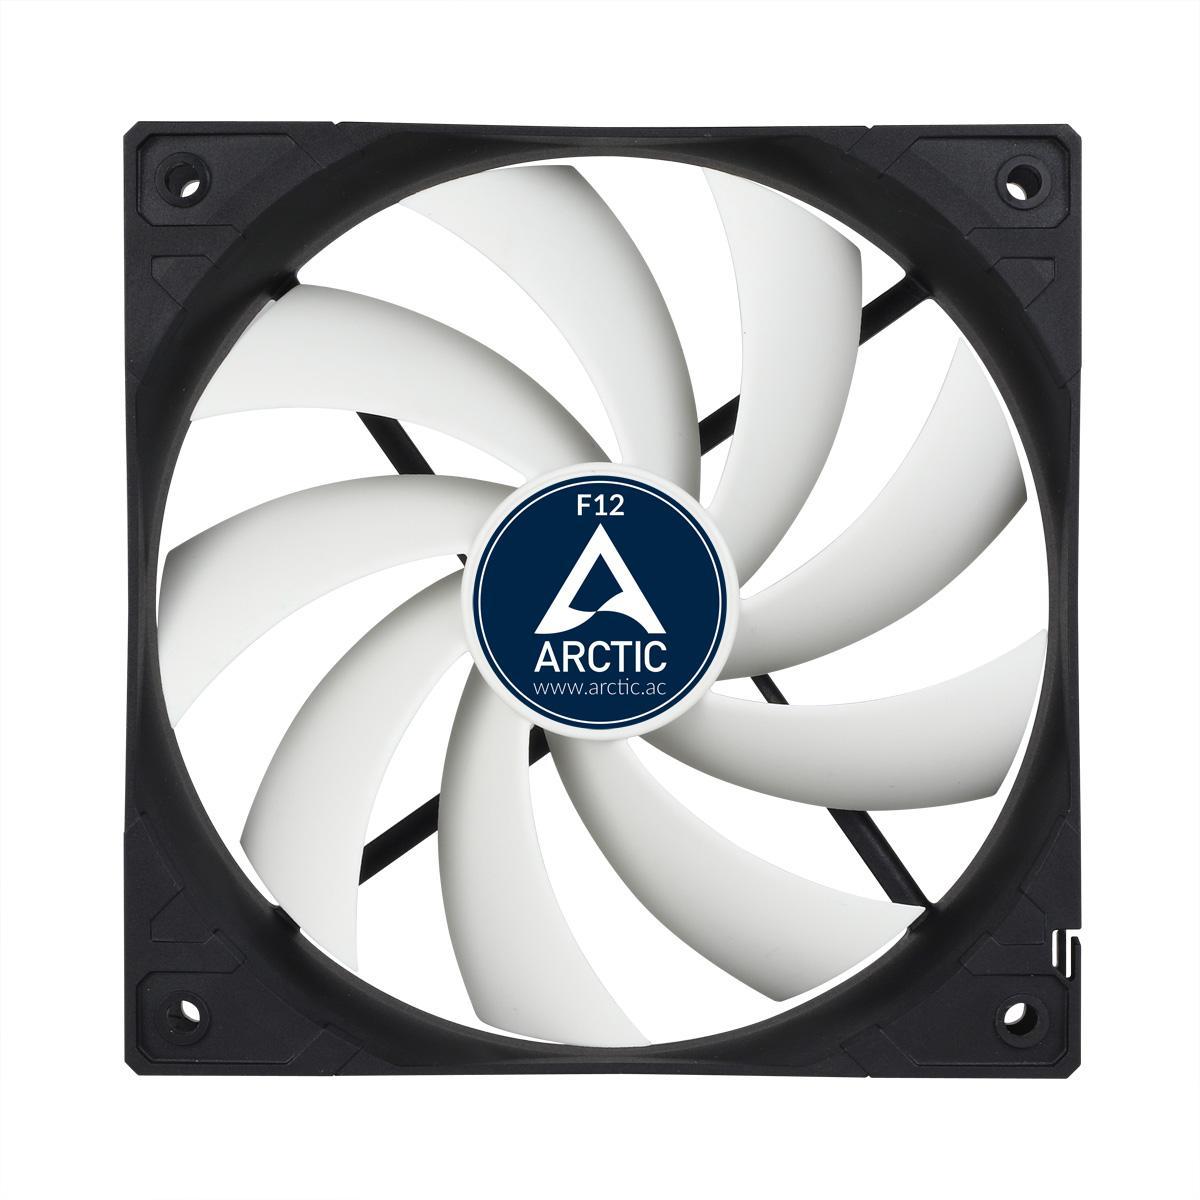 ARCTIC F12 74 CFM 120 mm Fan